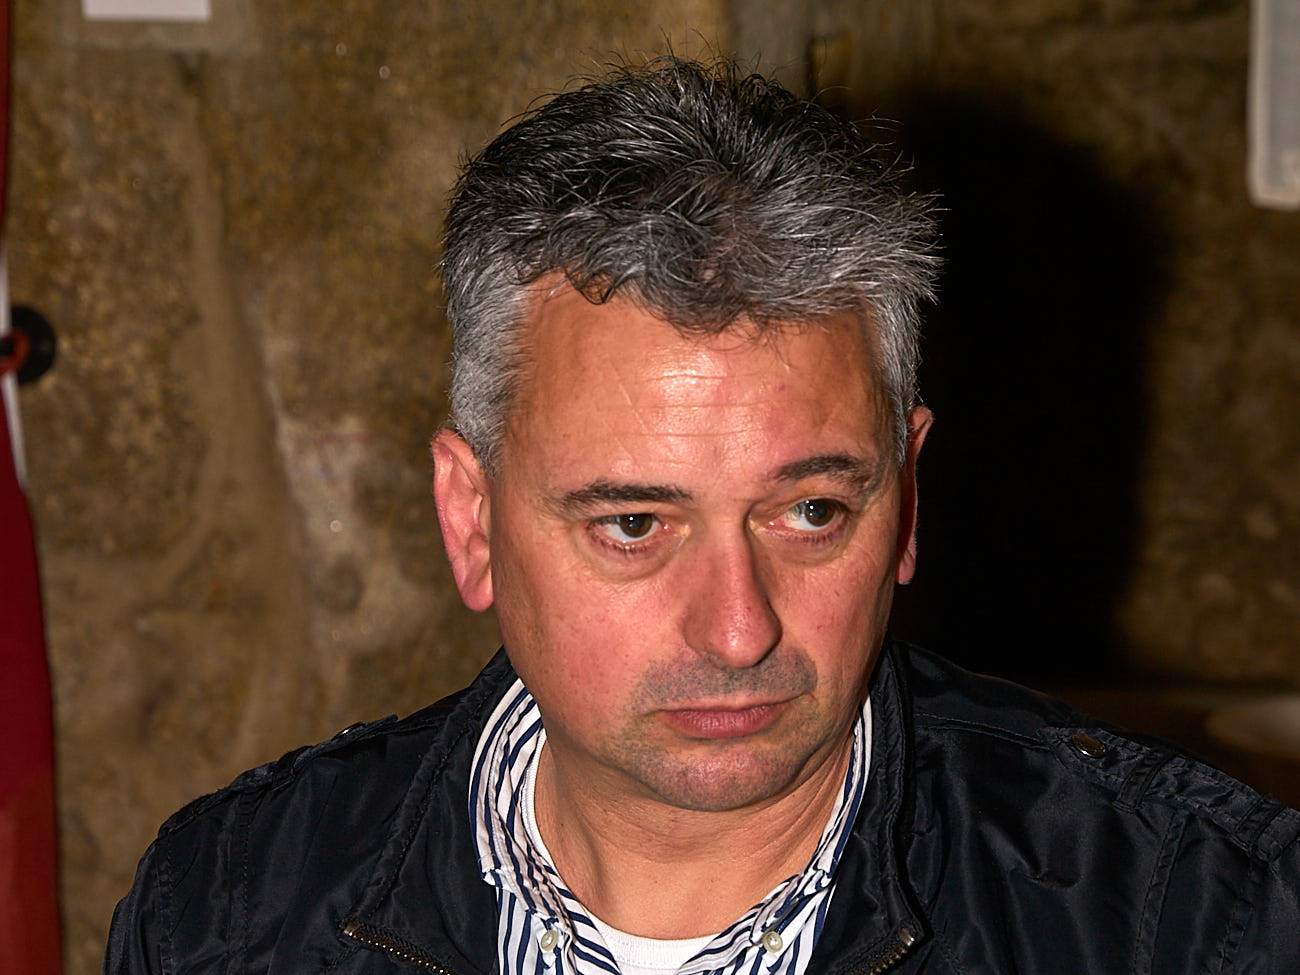 Encontro en Lestrove - Foro Peinador 25/02/2010